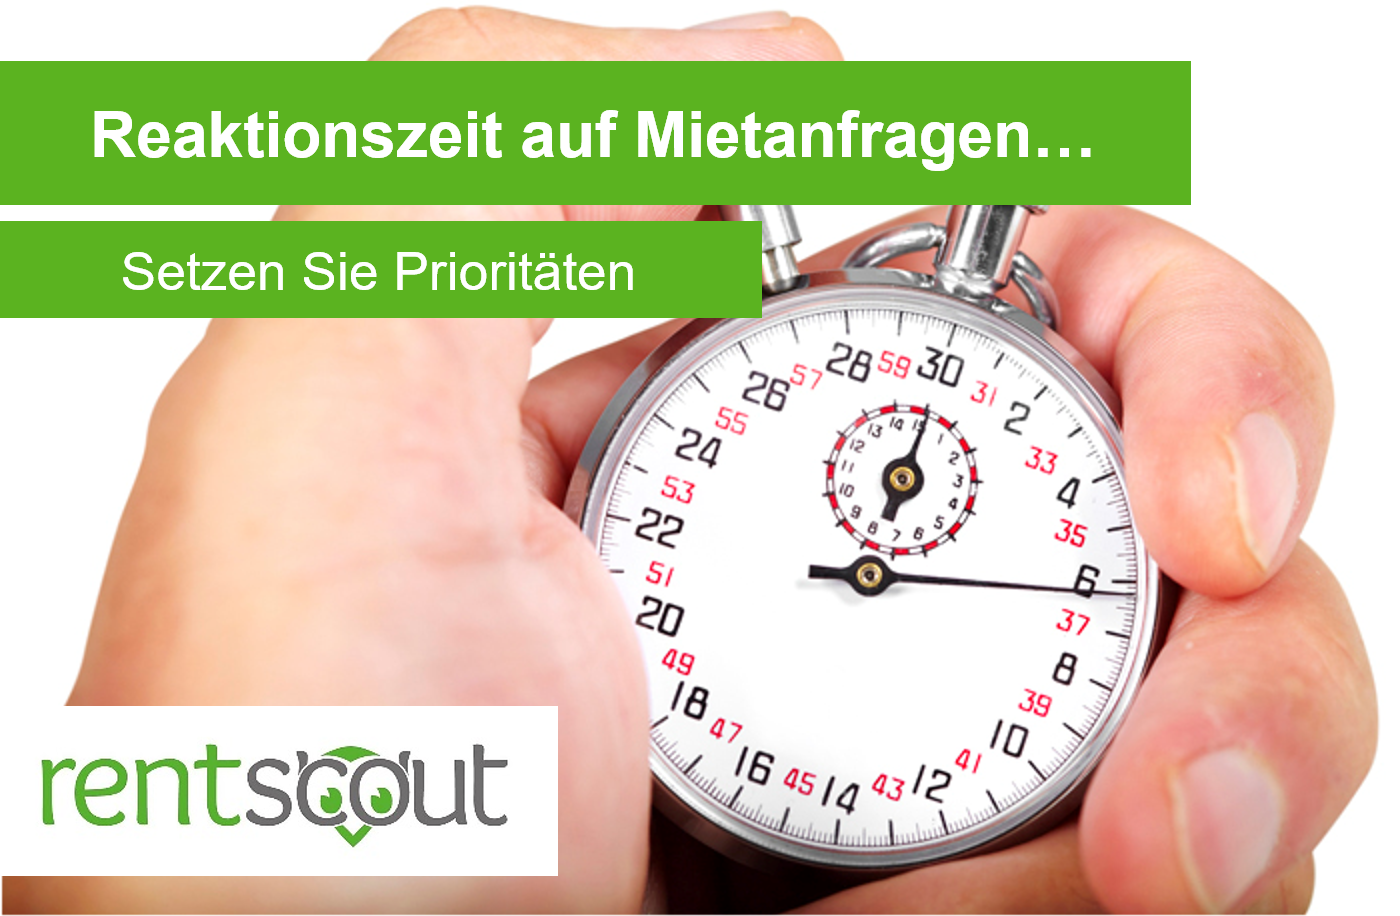 Vermieten_Reaktionszeit_Mietportal_rentscout